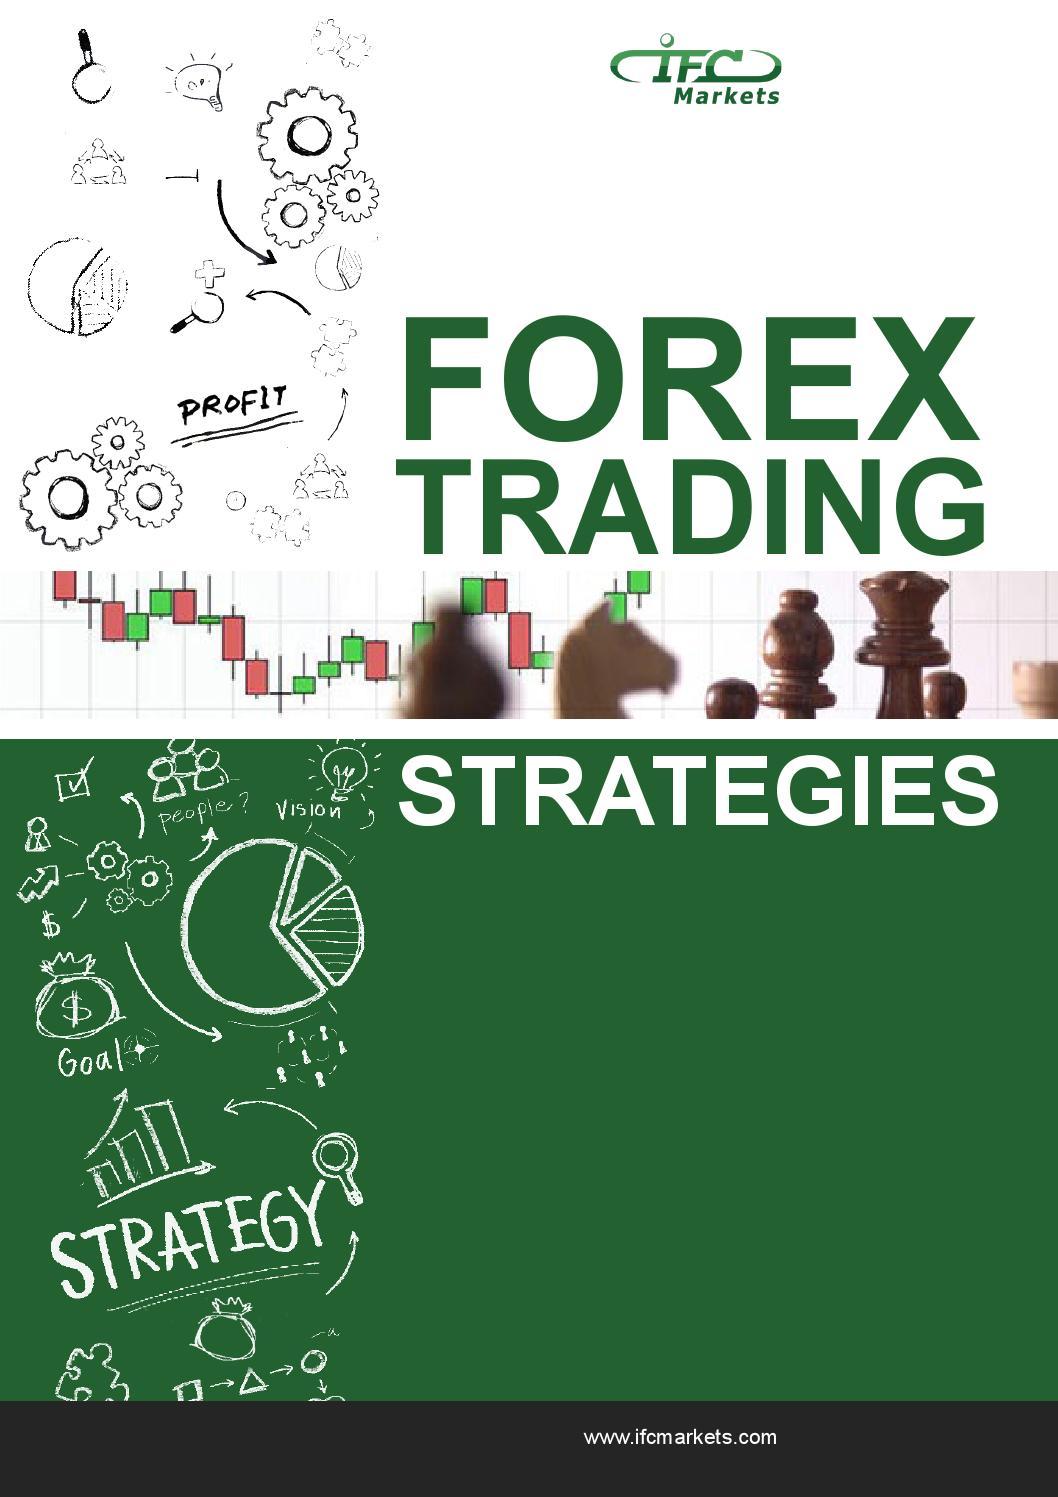 Forex ifc markets